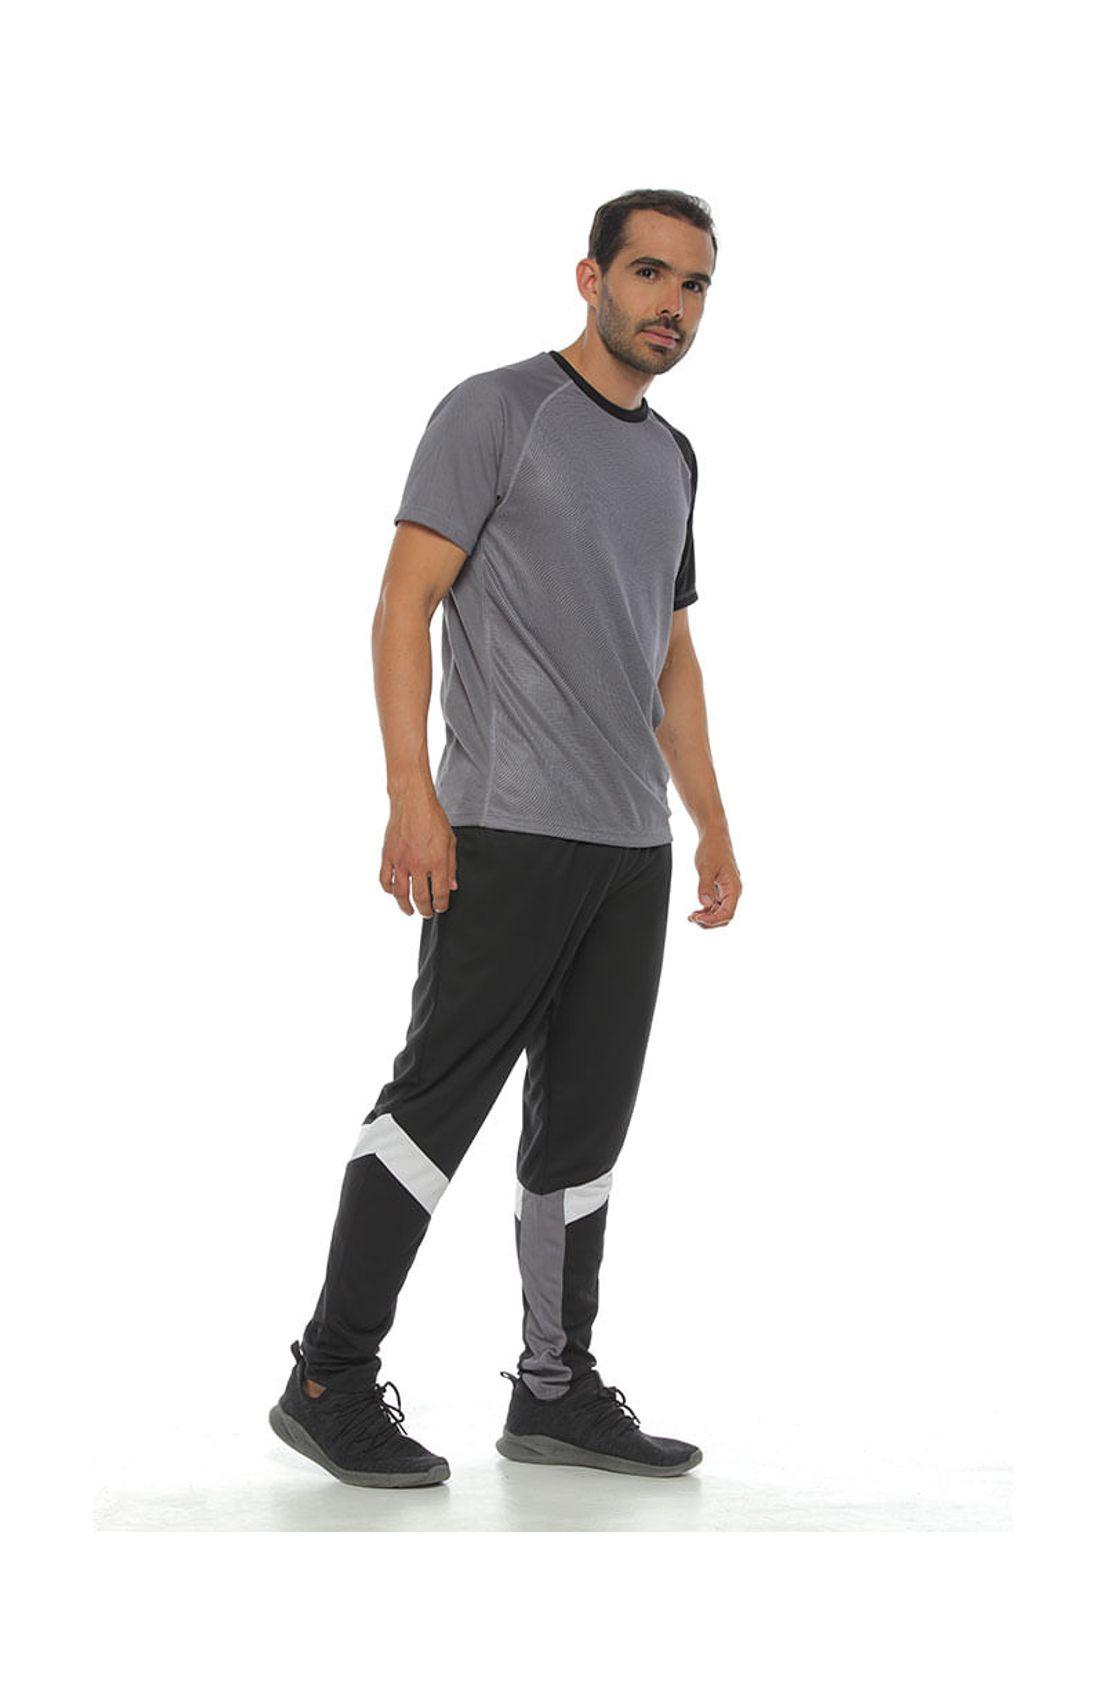 Pantalon Sudadera Deportiva Color Negro Para Hombre Racketball Tennis